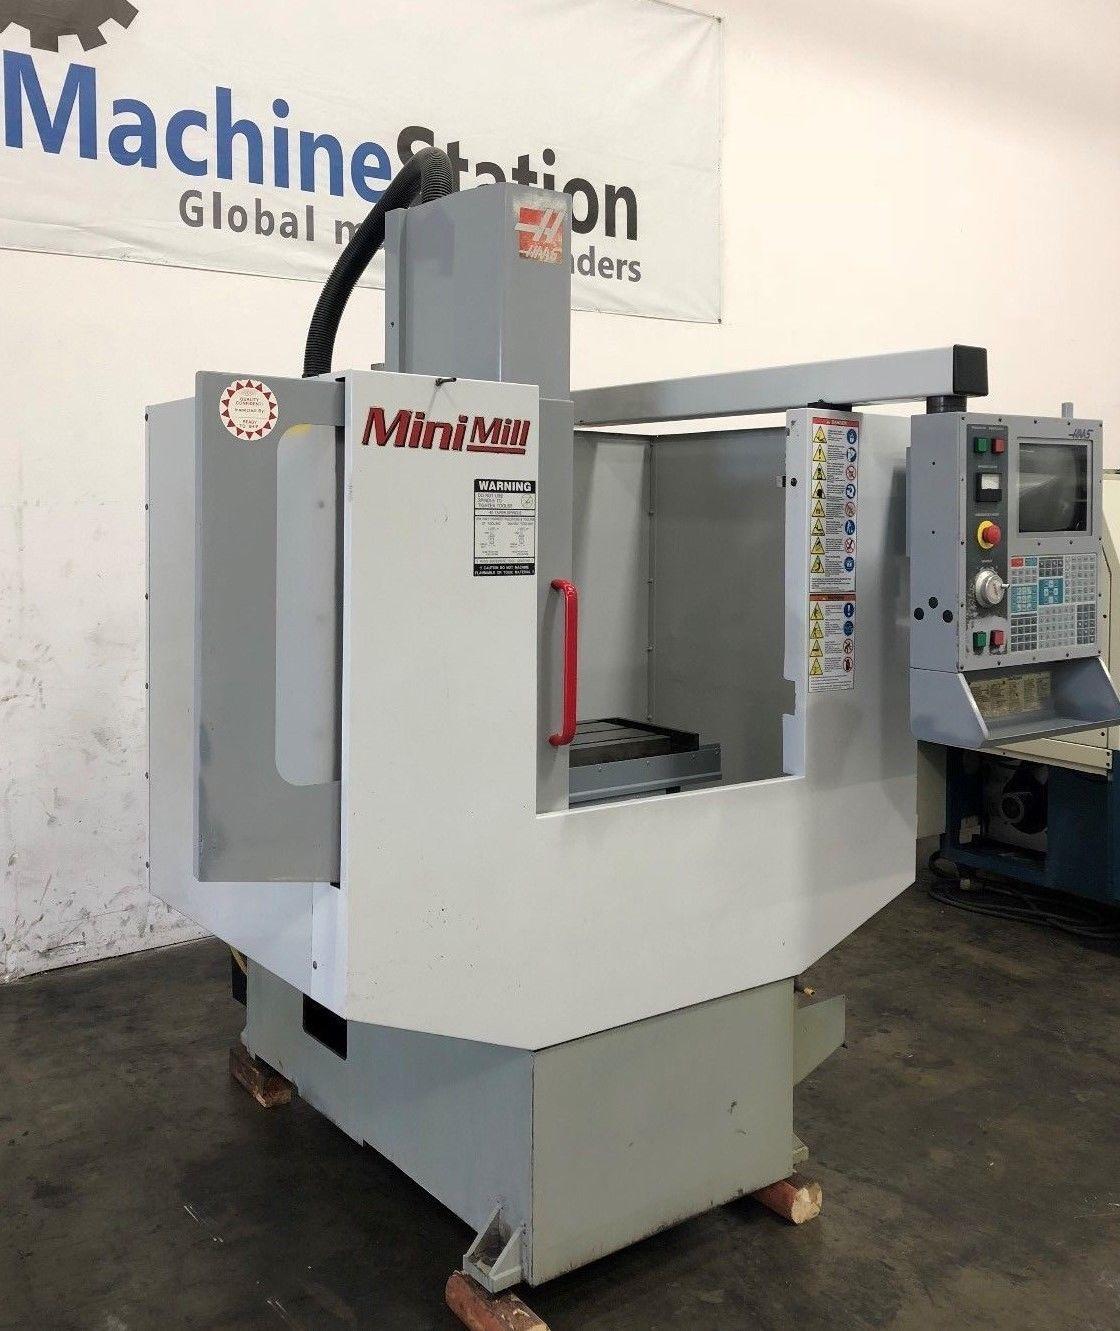 HAAS Mini Mill Vertical Machining Center - MachineStation